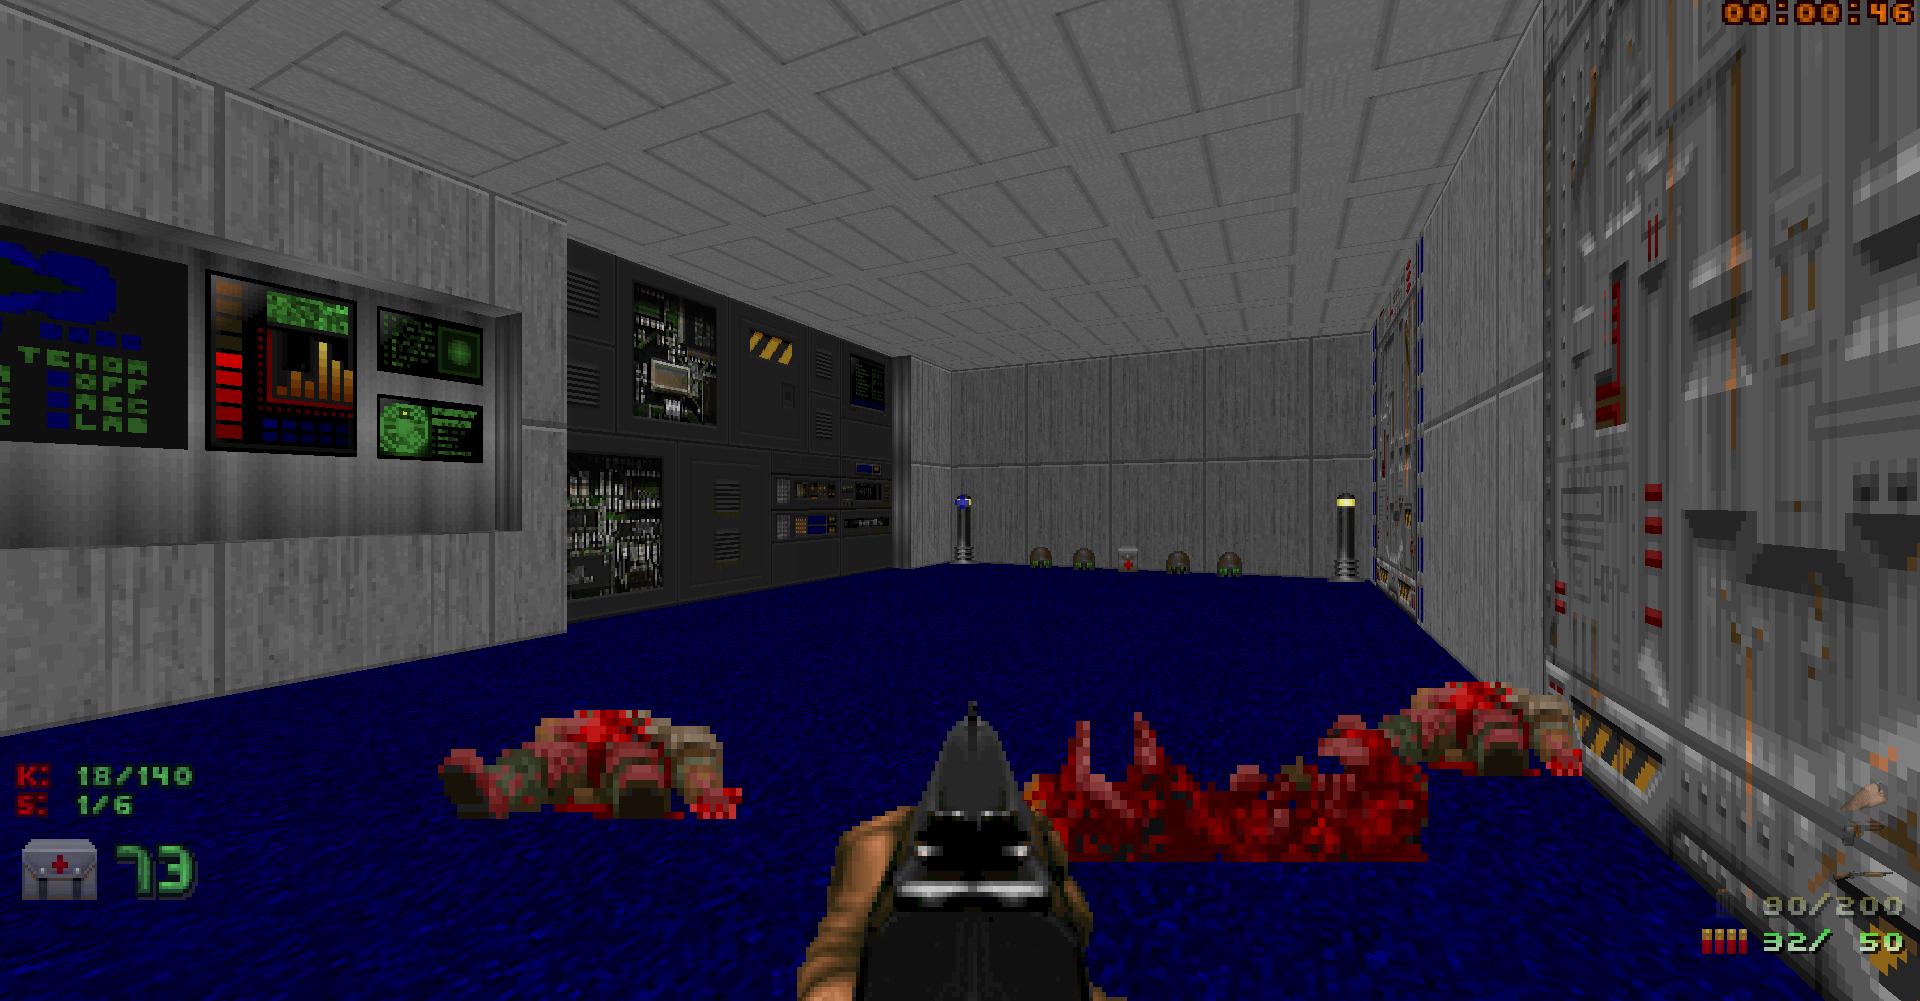 Screenshot_Doom_20210327_110613.png.b682fb950c8e2b5d1cd2c3c1049aa813.png